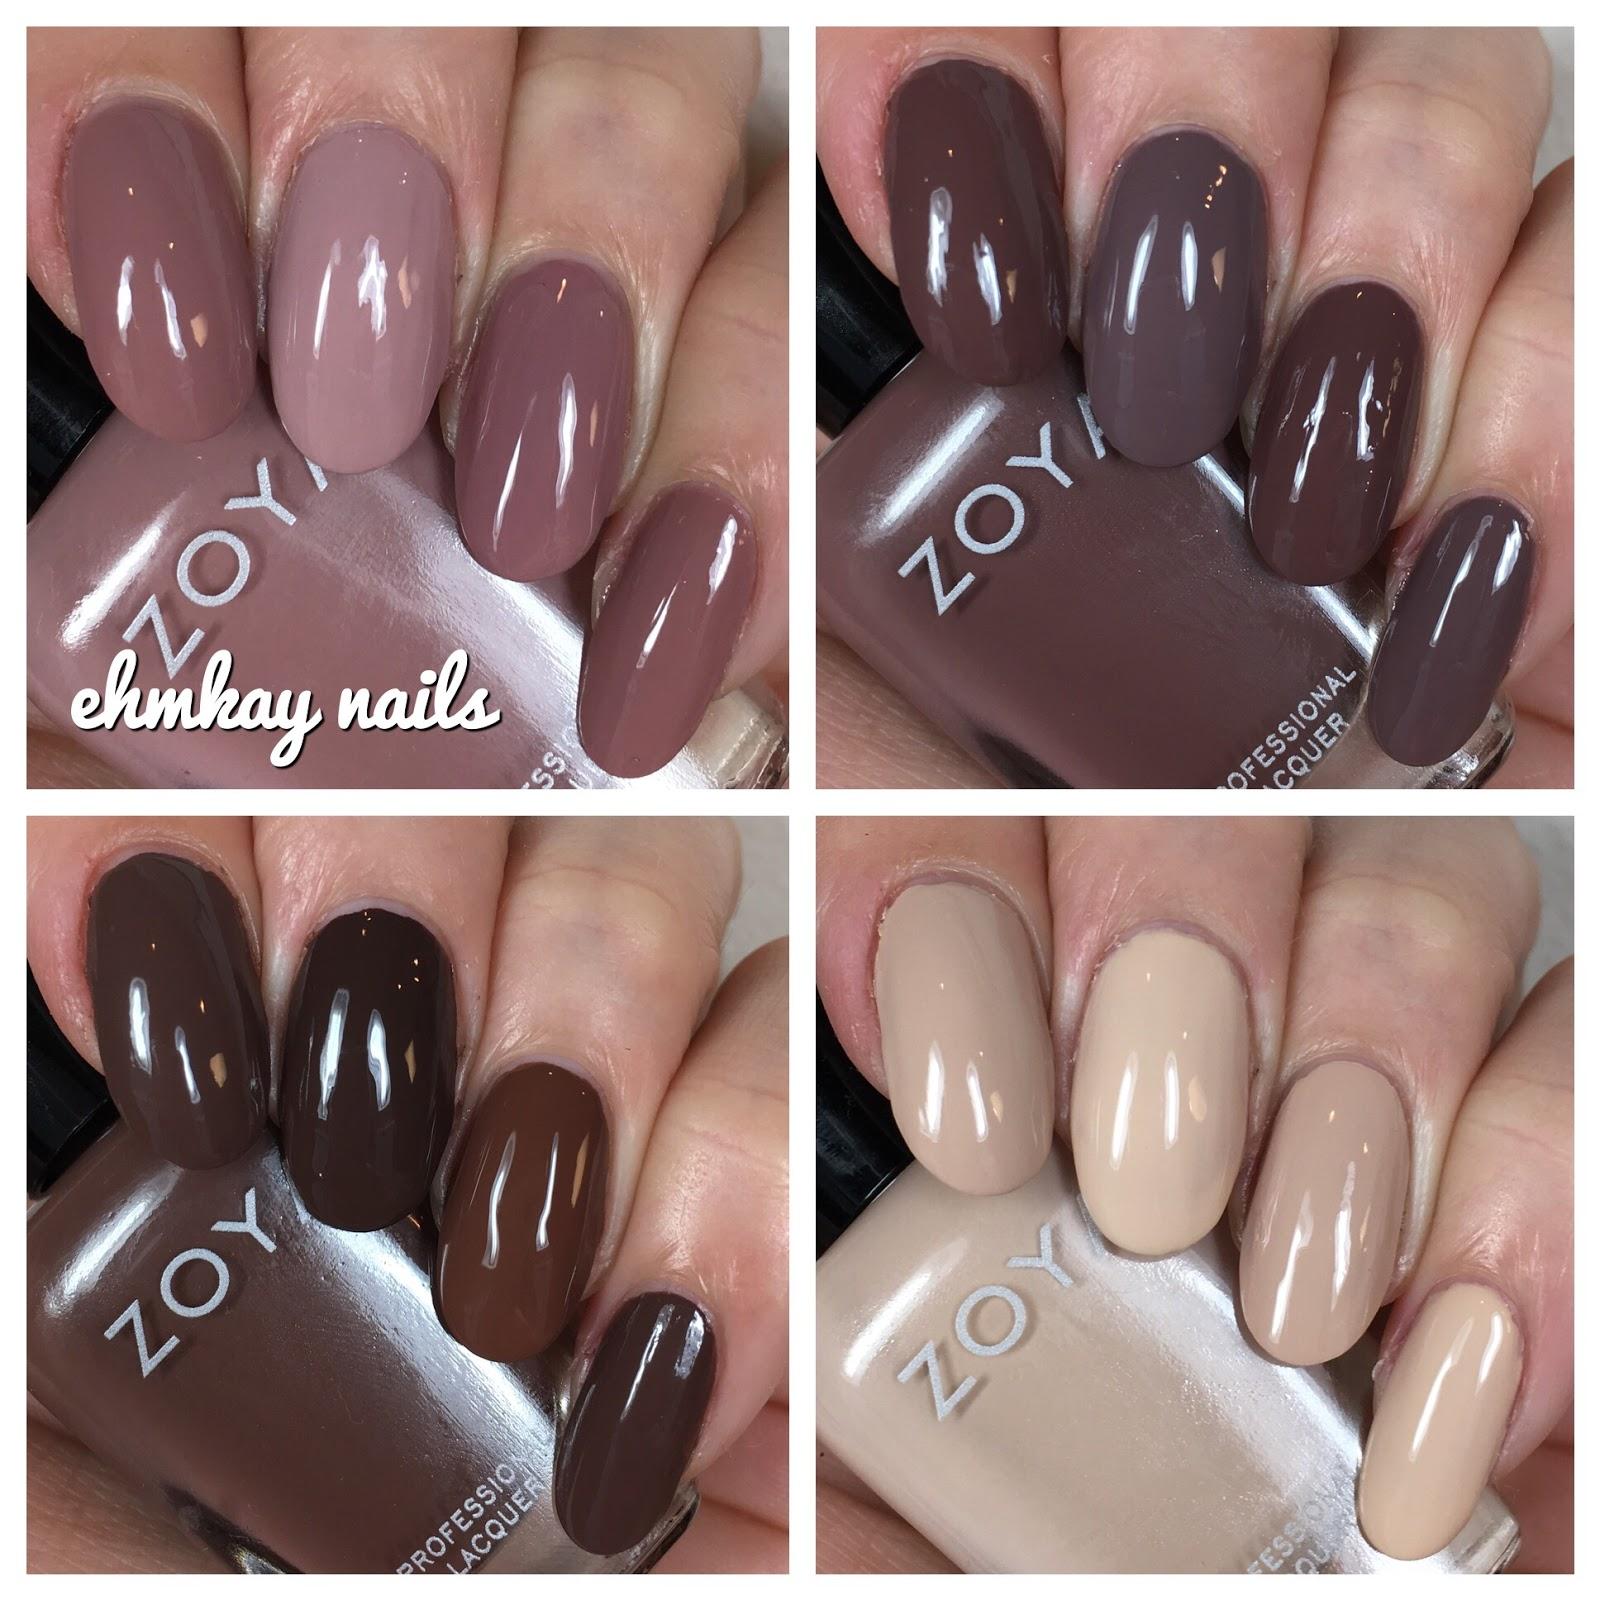 Ehmkay nails zoya naturel 3 comparisons zoya naturel 3 comparisons reheart Images